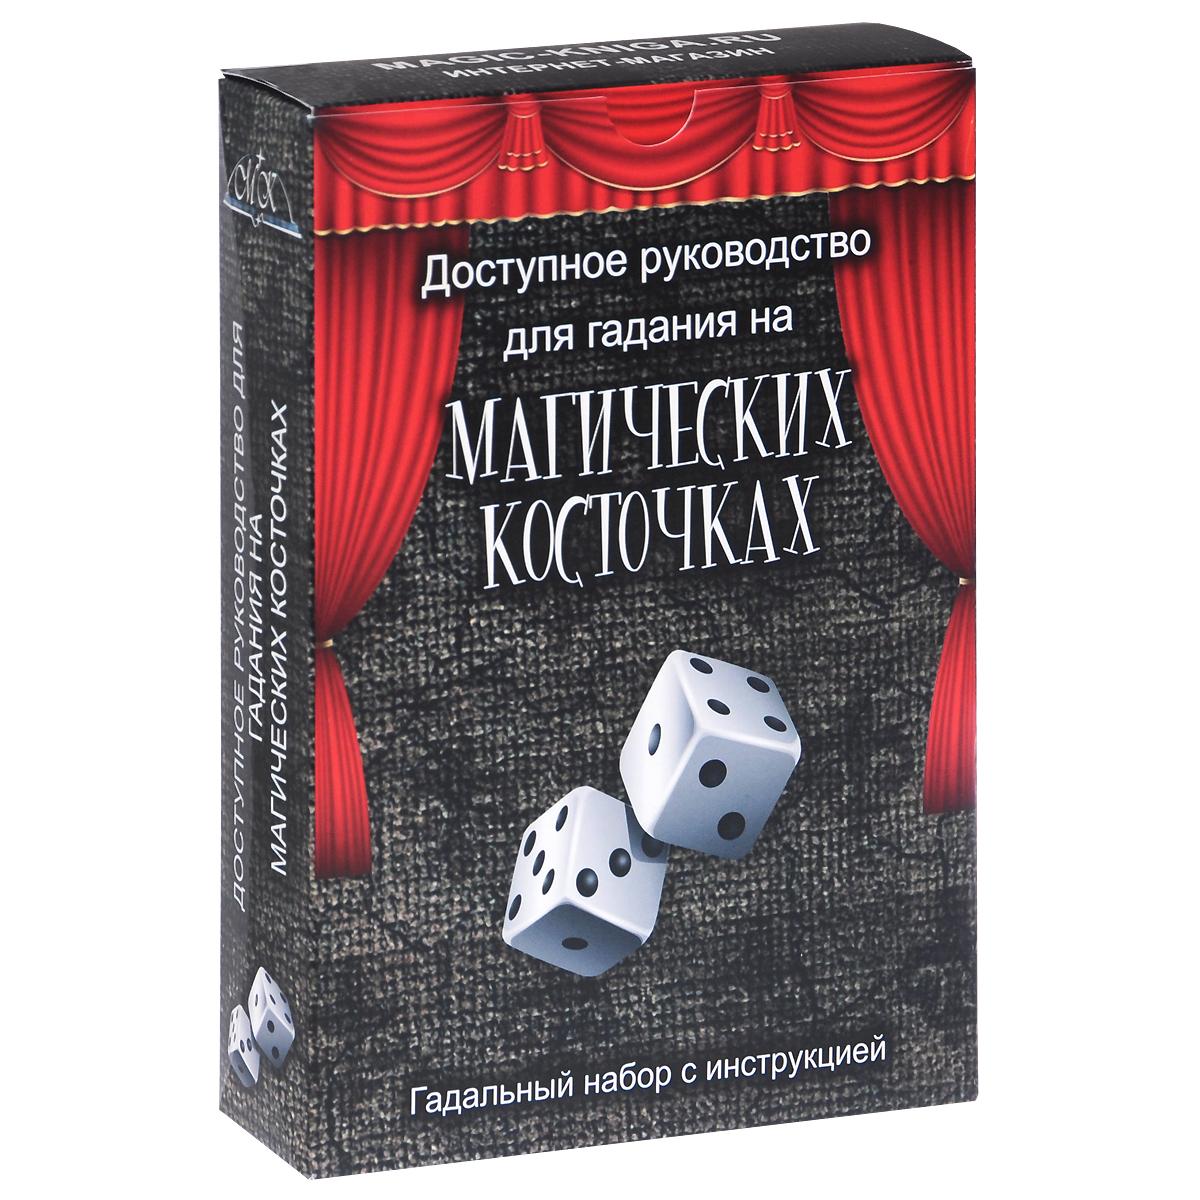 Zakazat.ru: Гадание на магических косточках. Руководство (+ магические косточки). А. С. Федосеев